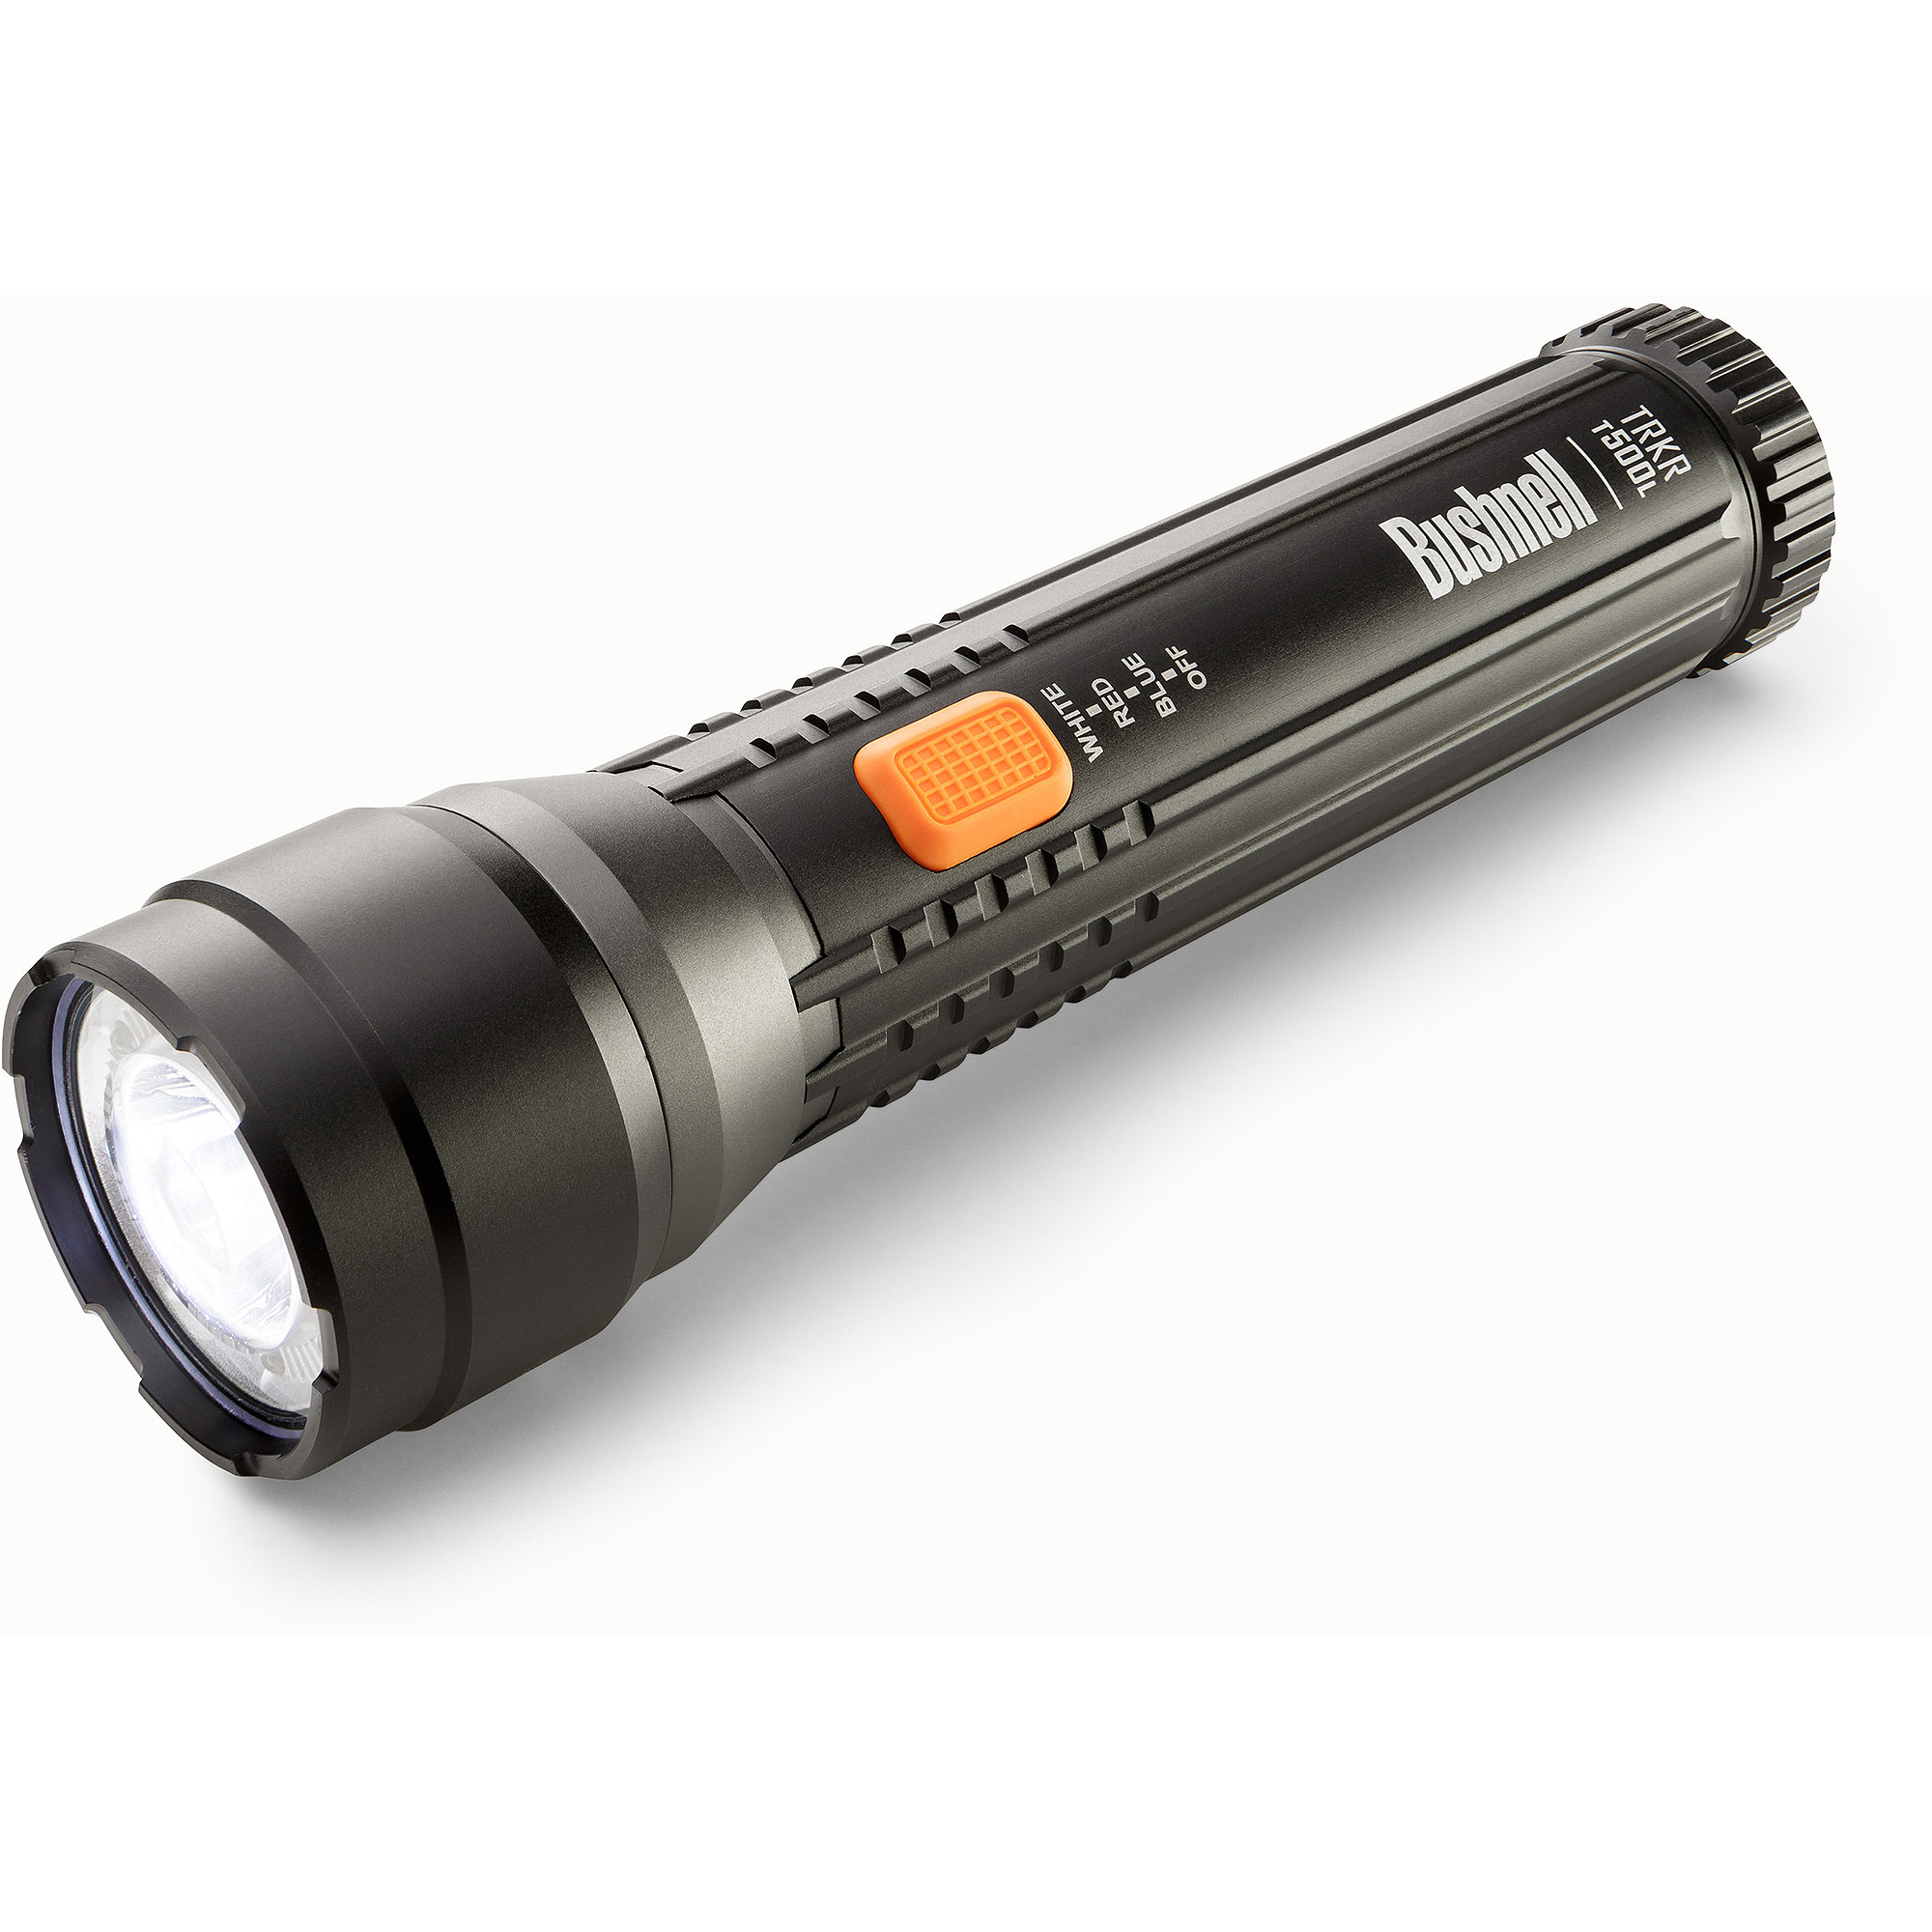 Bushnell TRKR 500-Lumen Multi-Color Flashlight, 162m Beam